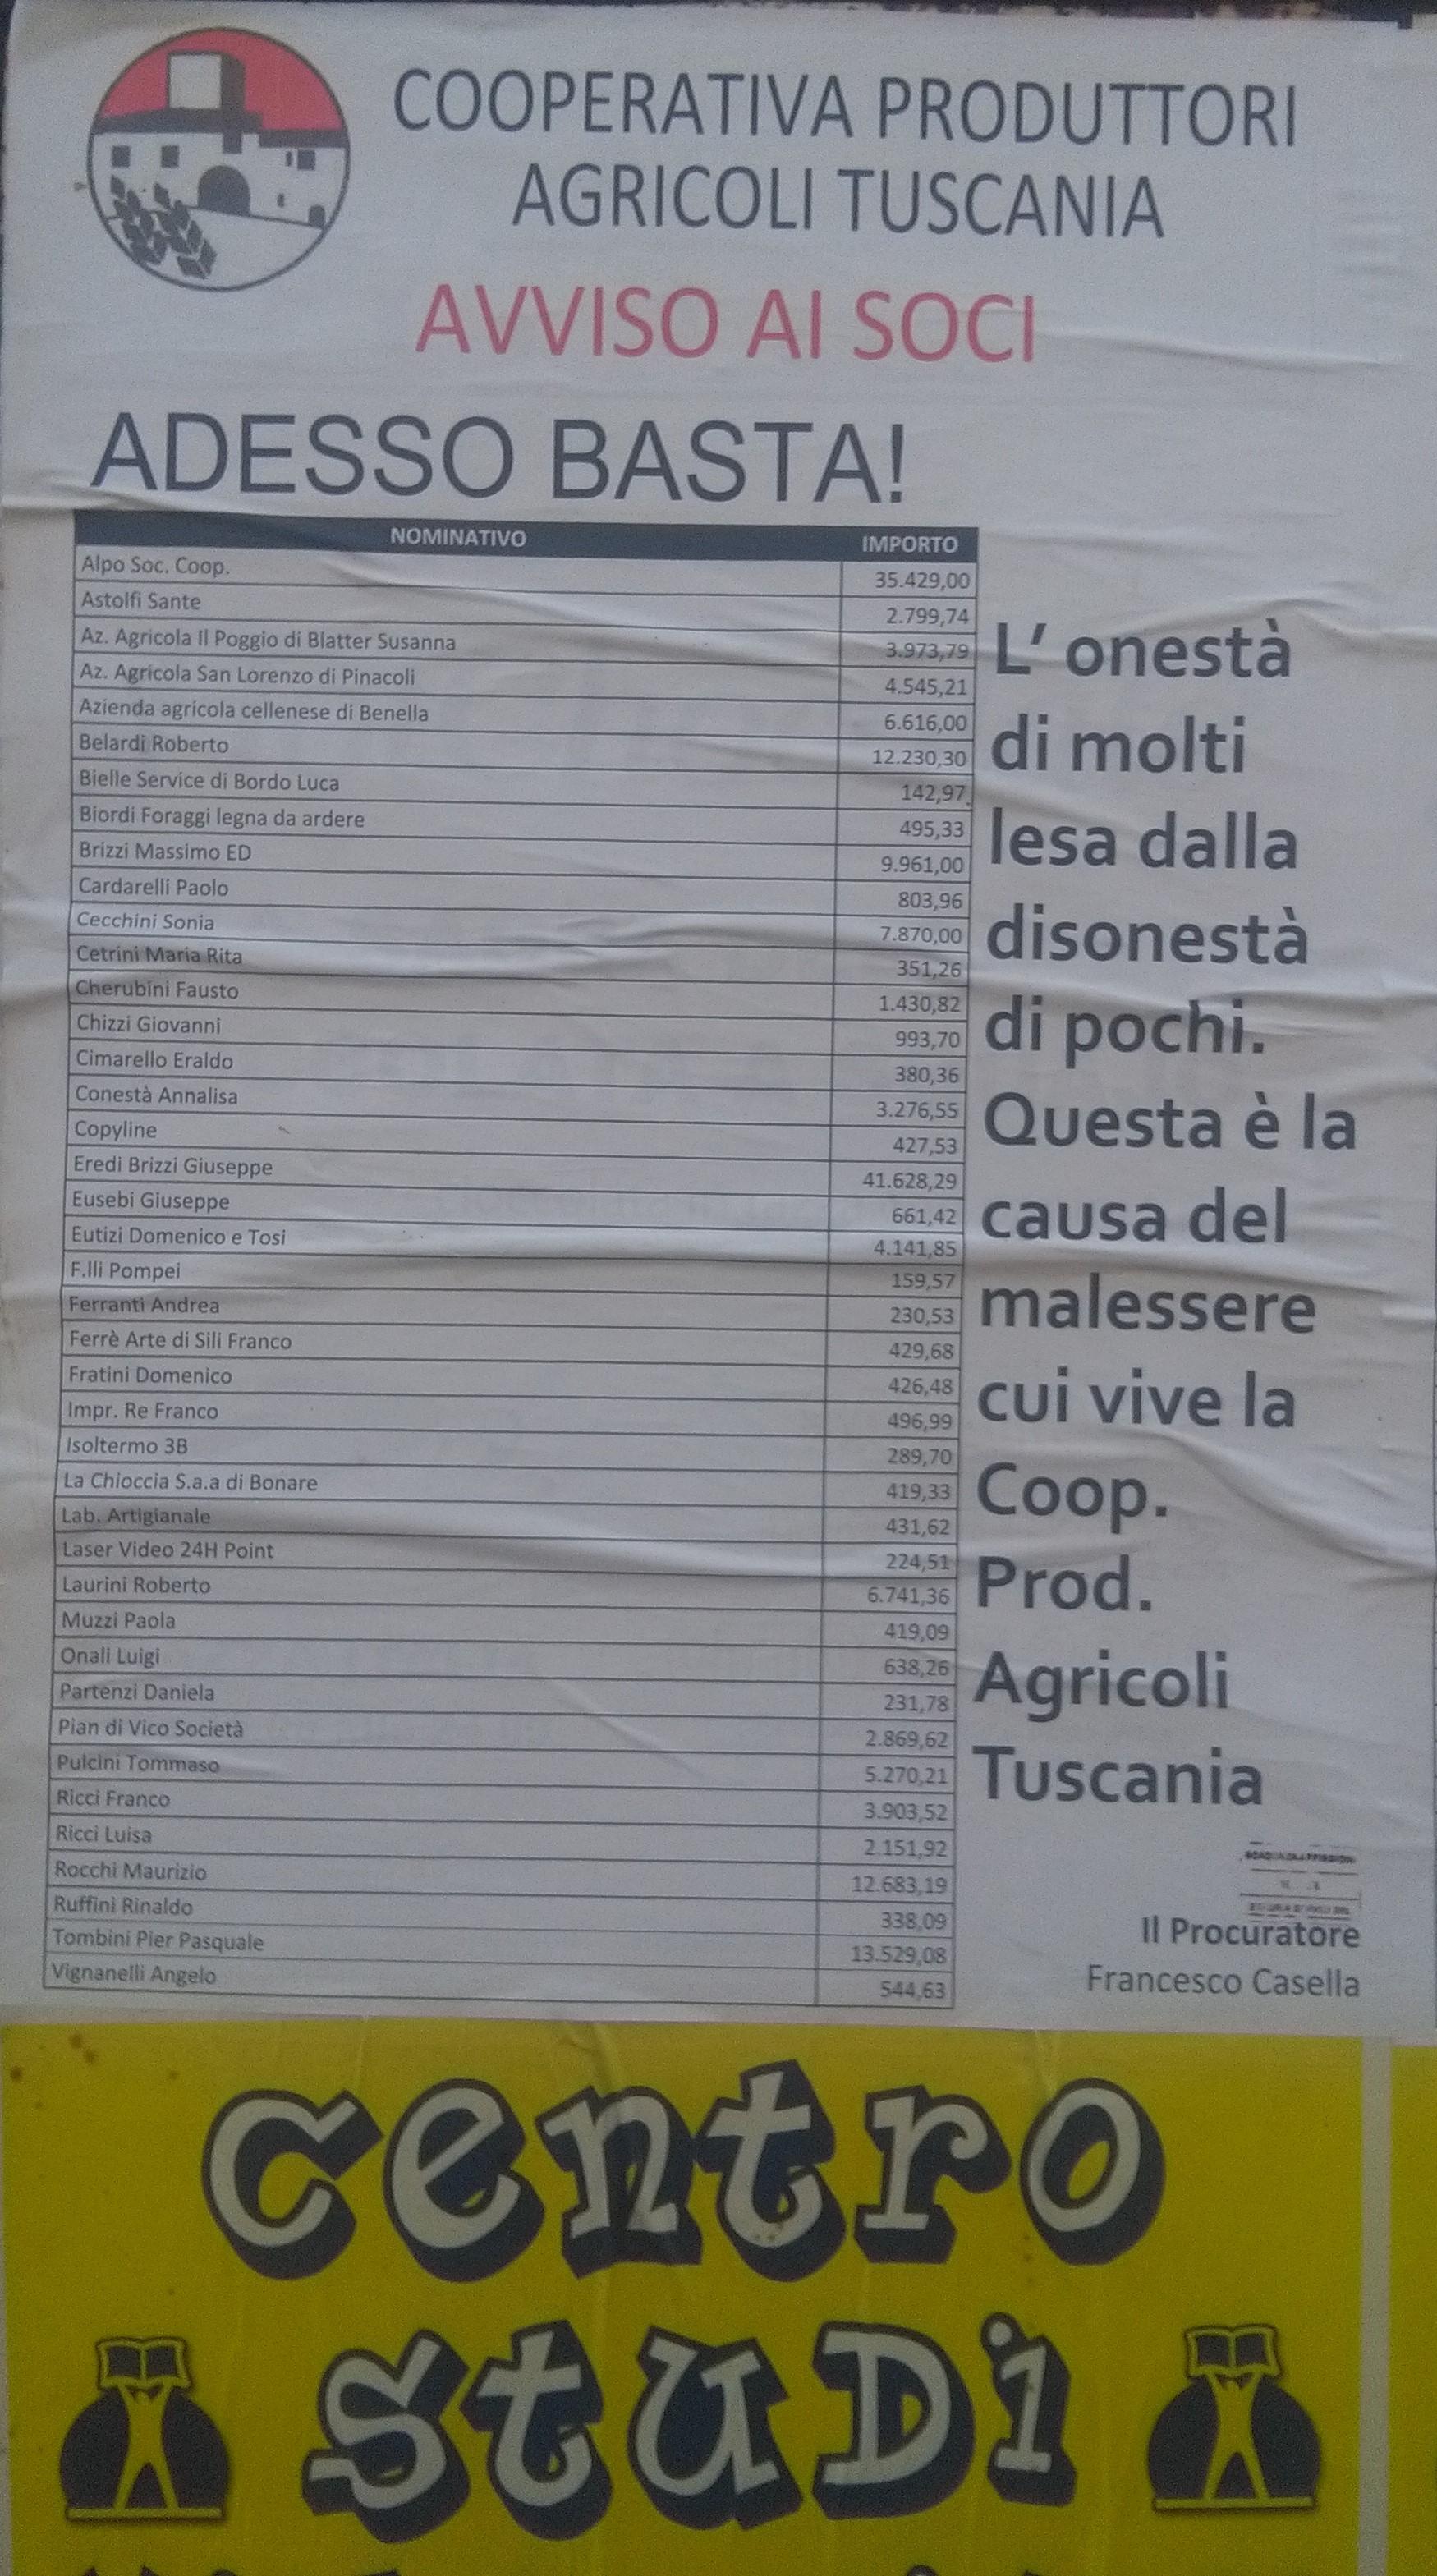 cooperativa-produttori-agricoli-tuscania